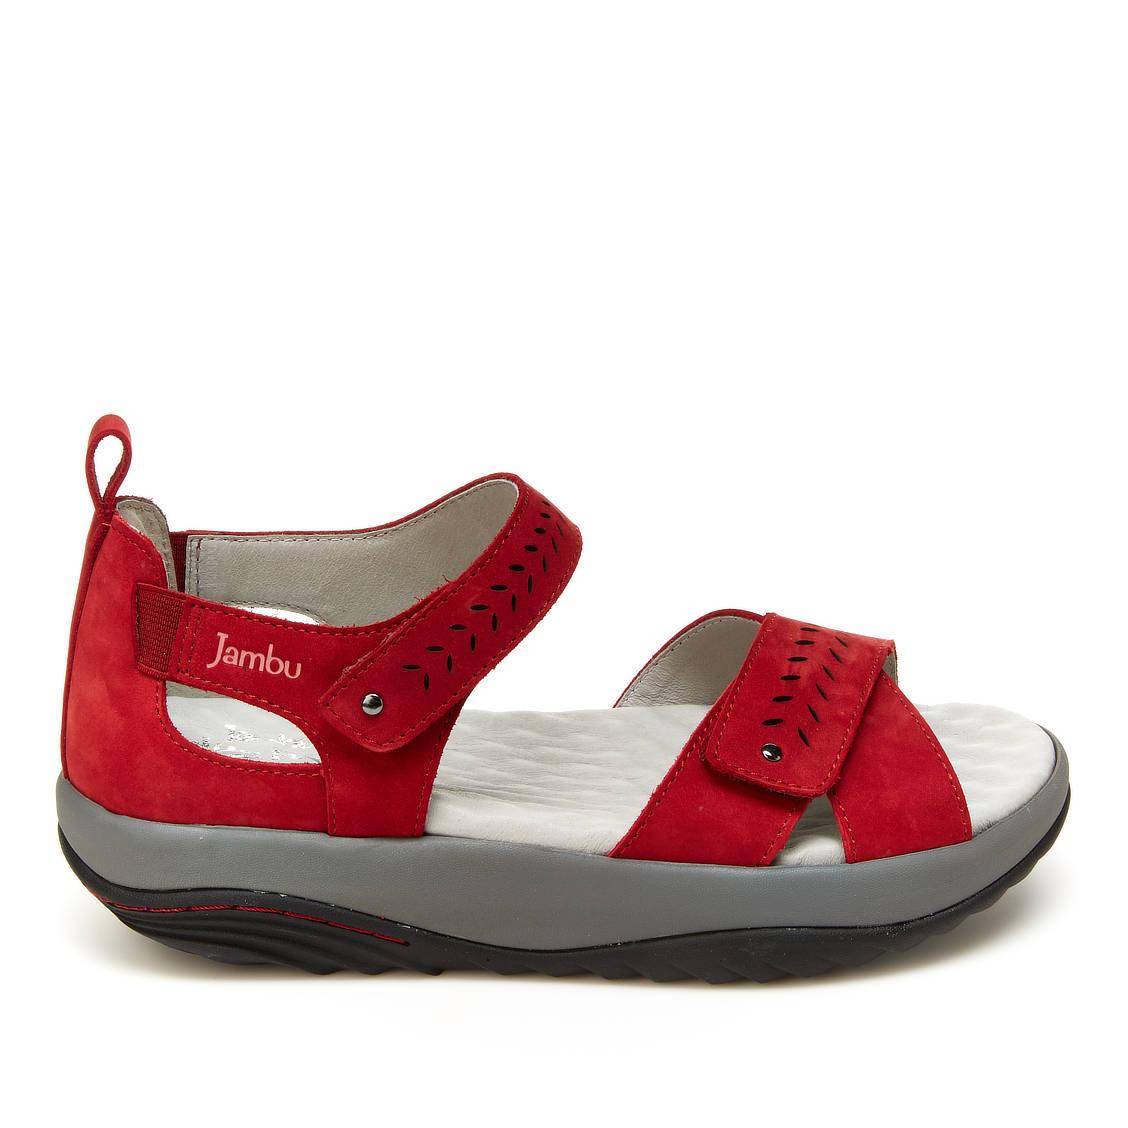 jambu-sedona-j1sed03-red-2